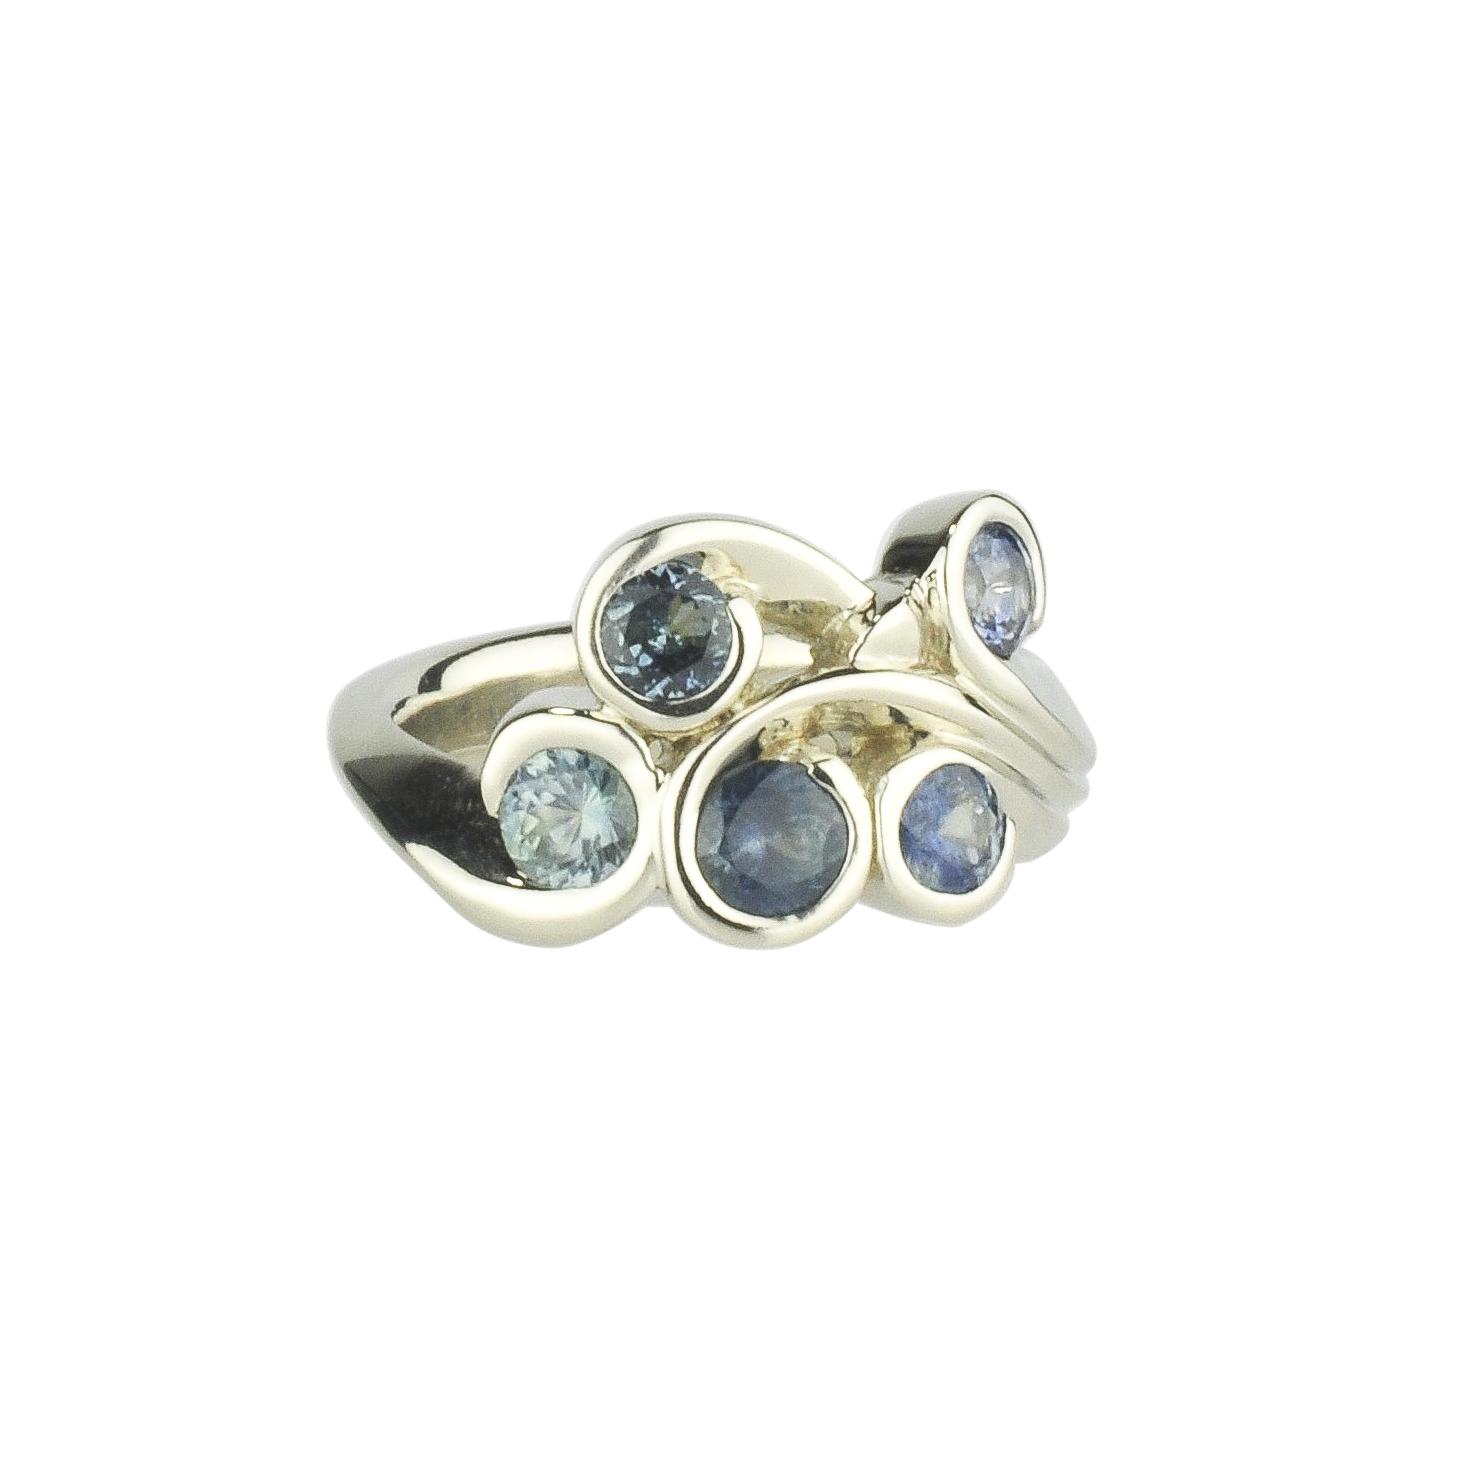 14k White Gold Super Sexy Swirl Ring with Montana Sapphires by Waylon Rhoads Jewelry